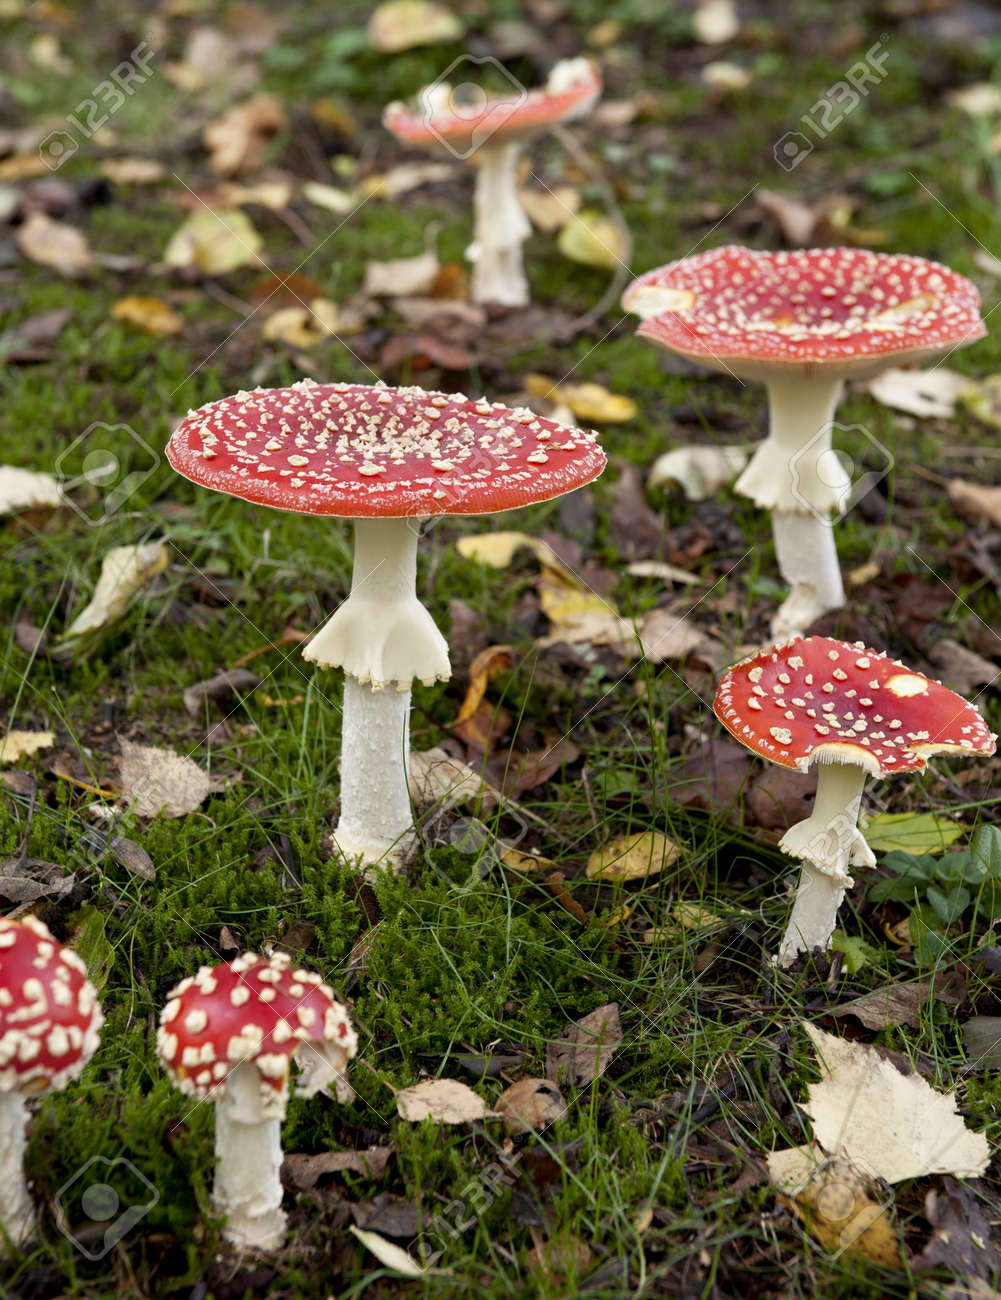 Fly agaric or fly Amanita mushrooms, Amanita muscaria - 8651225